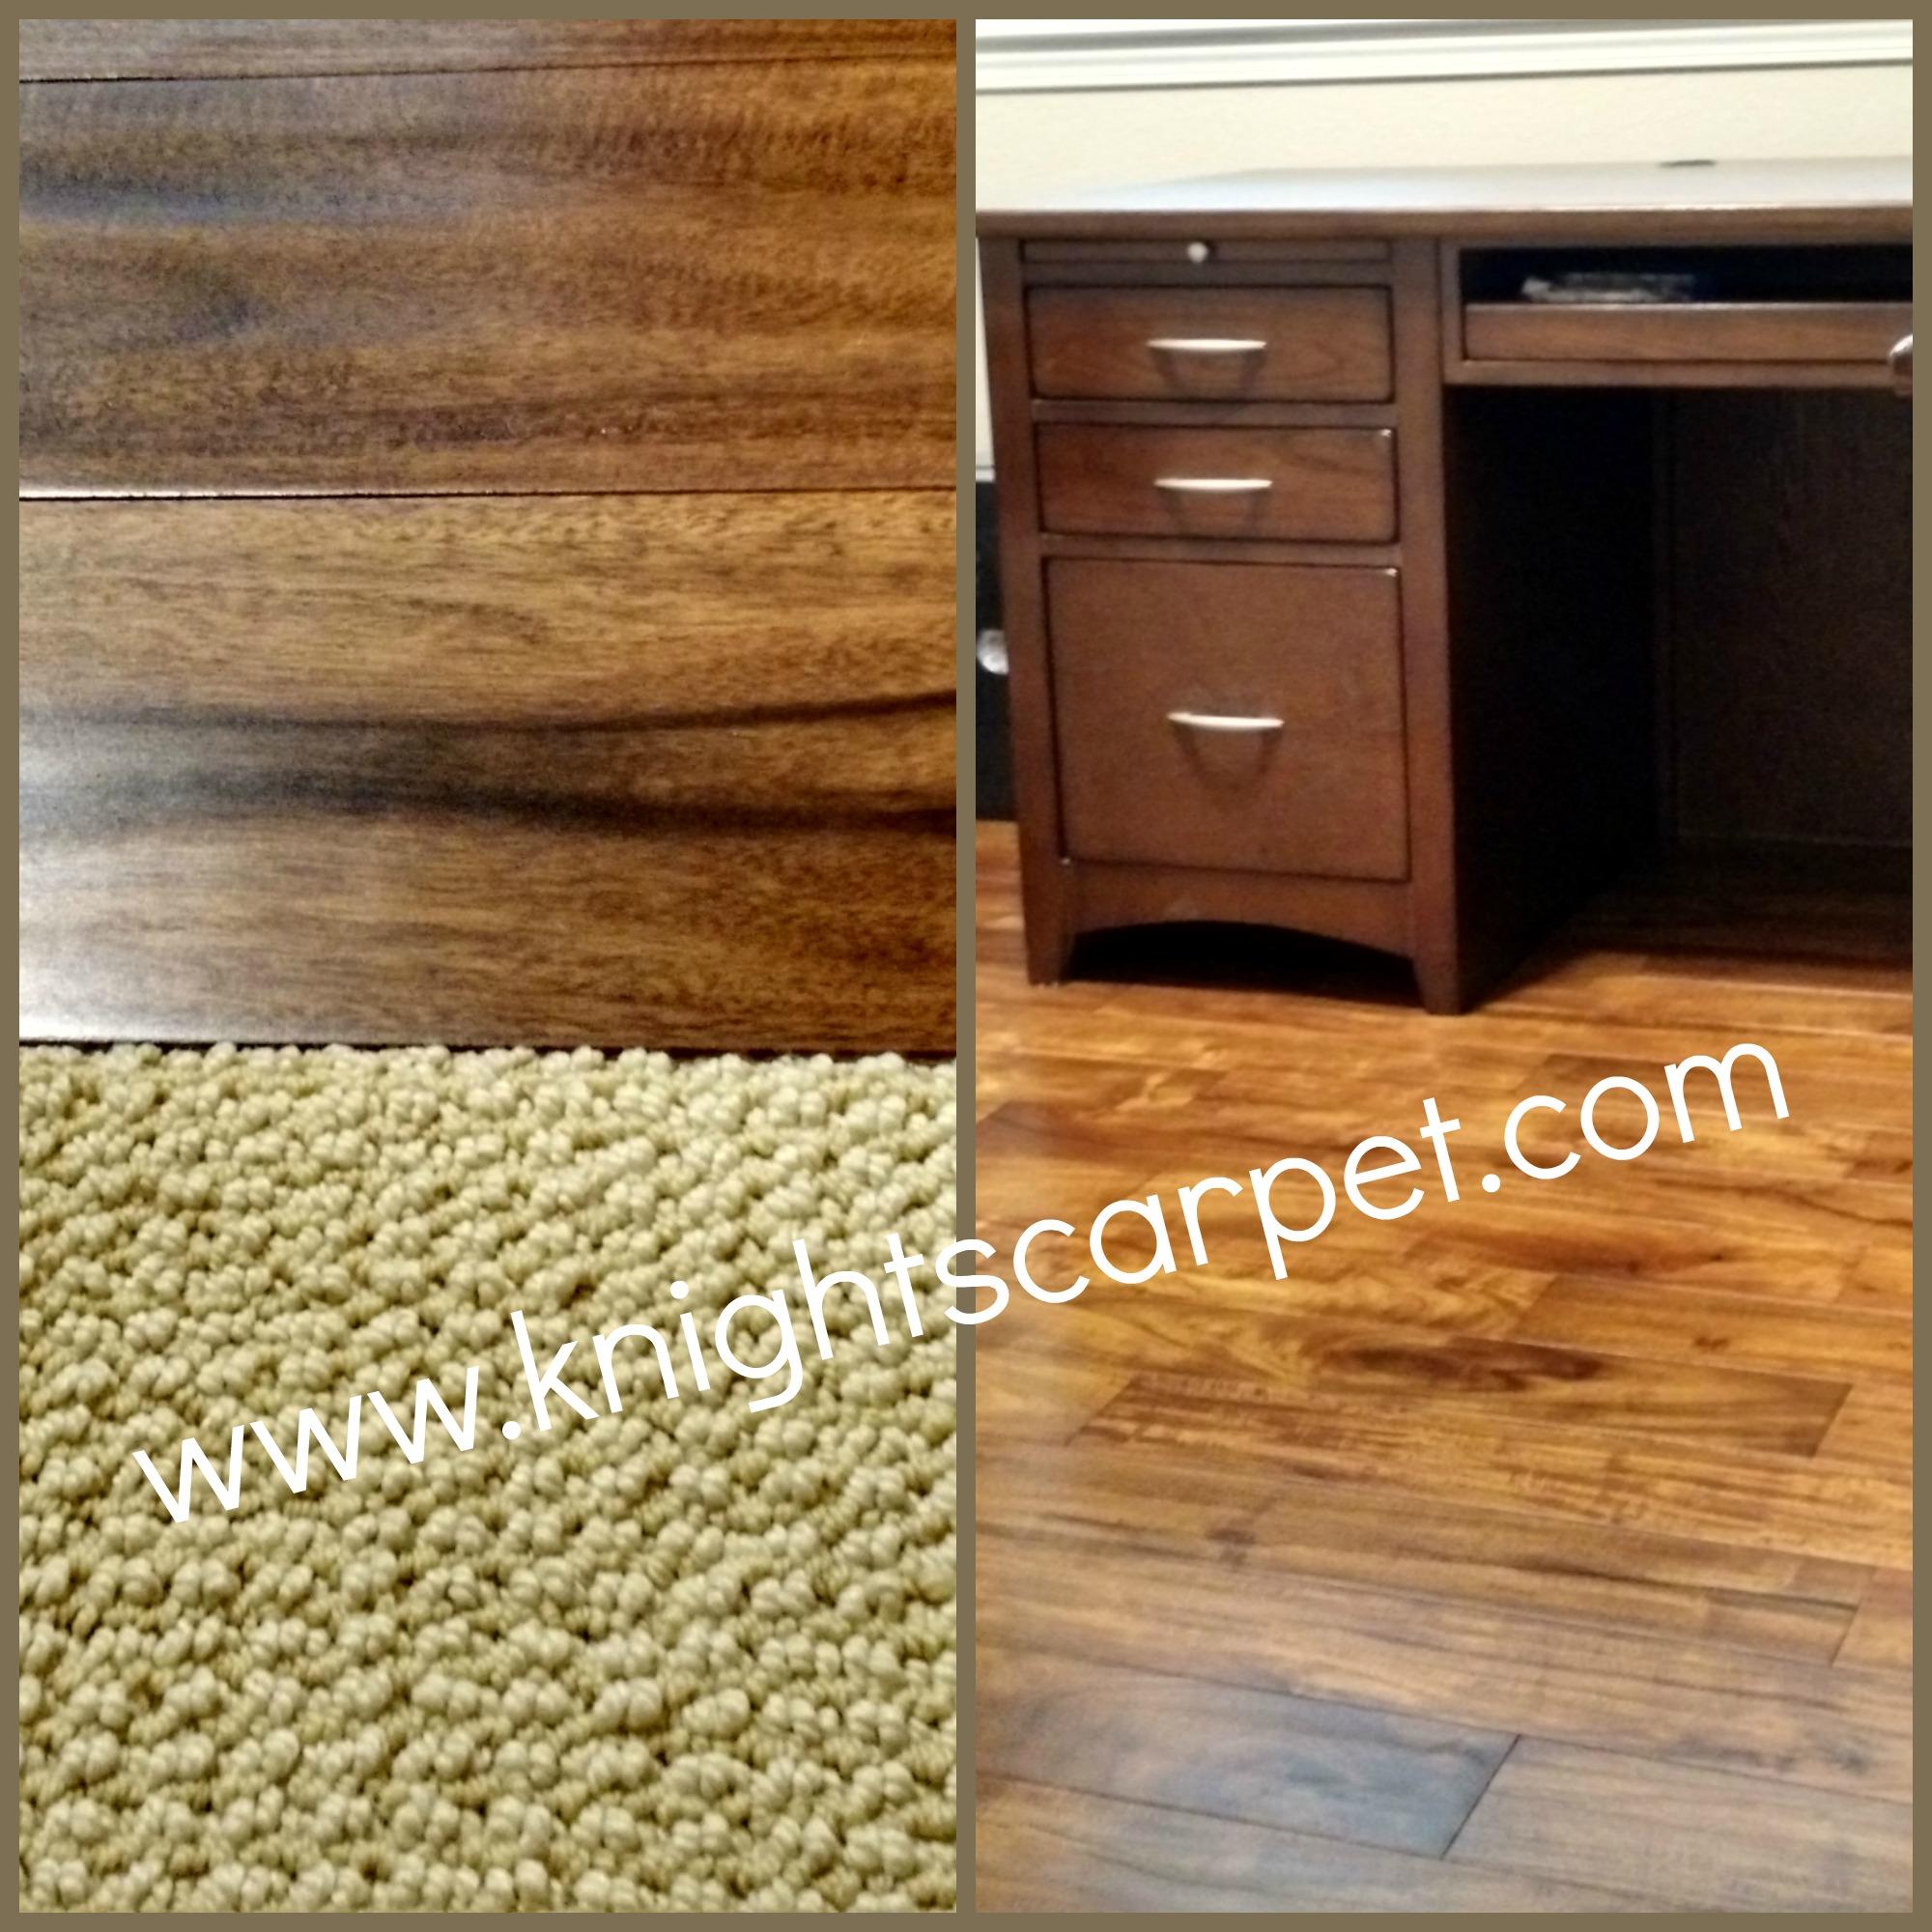 Hardwood meets Carpet